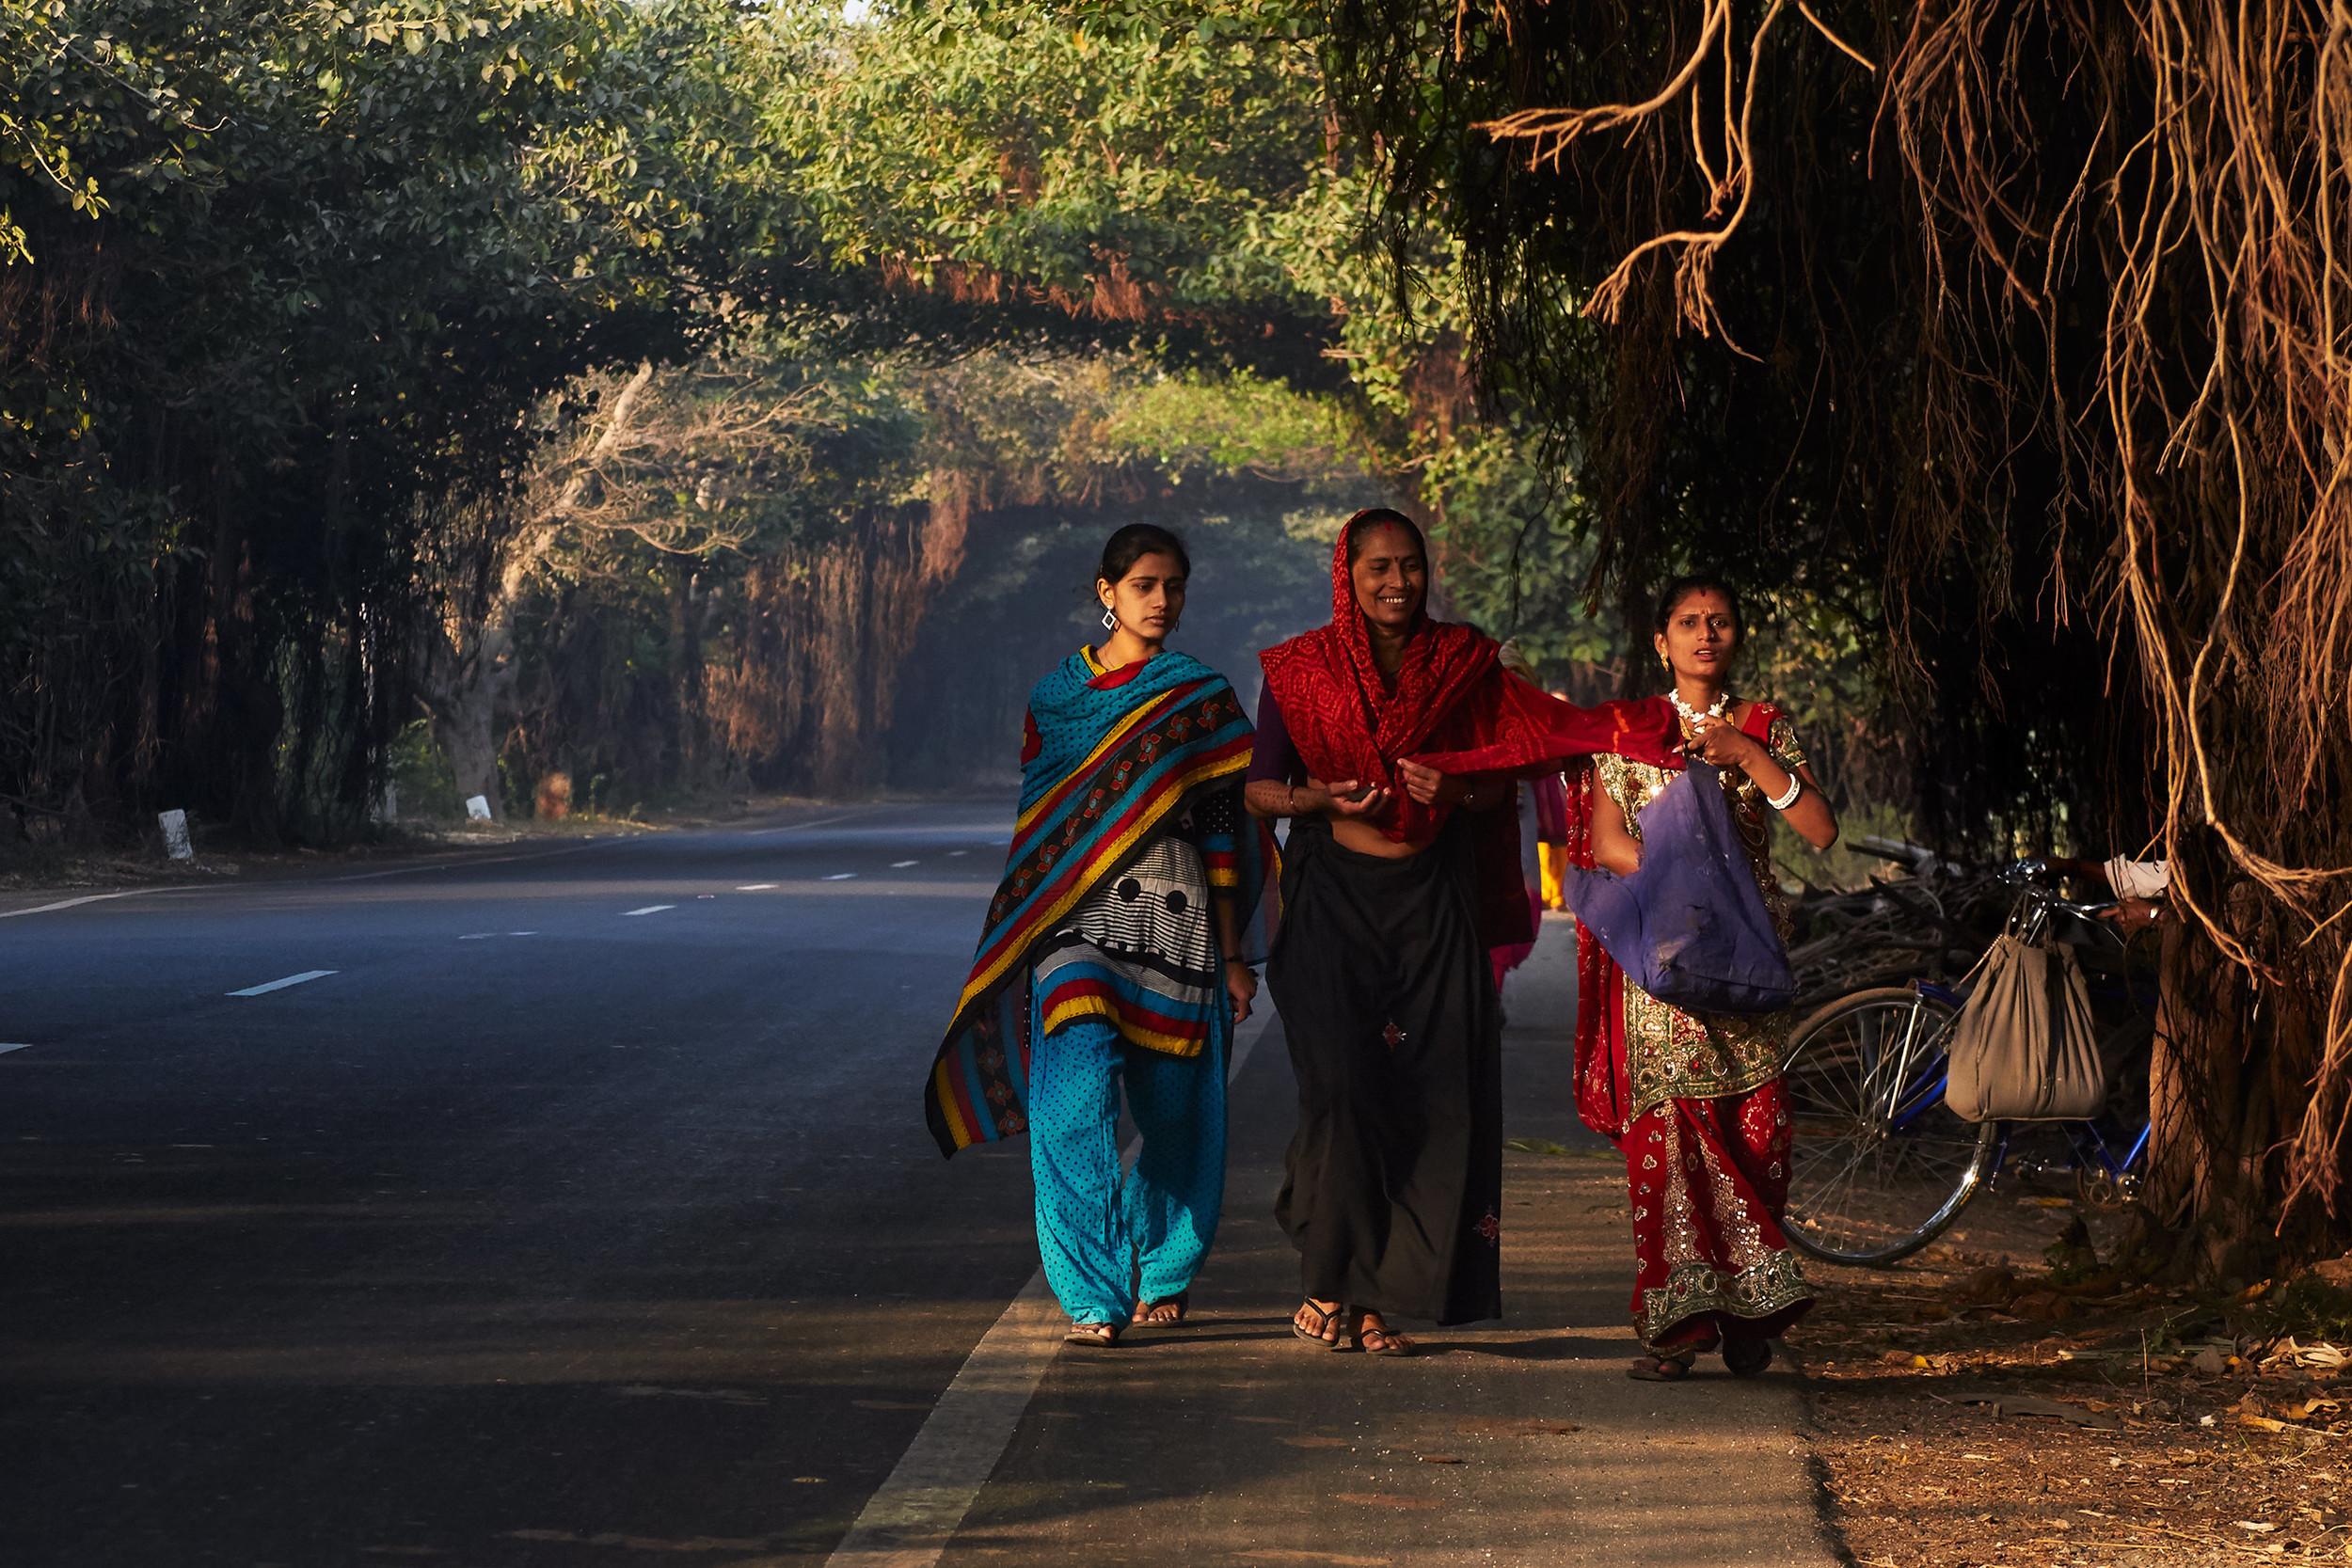 Women walking through tunnels of banyan trees along a road